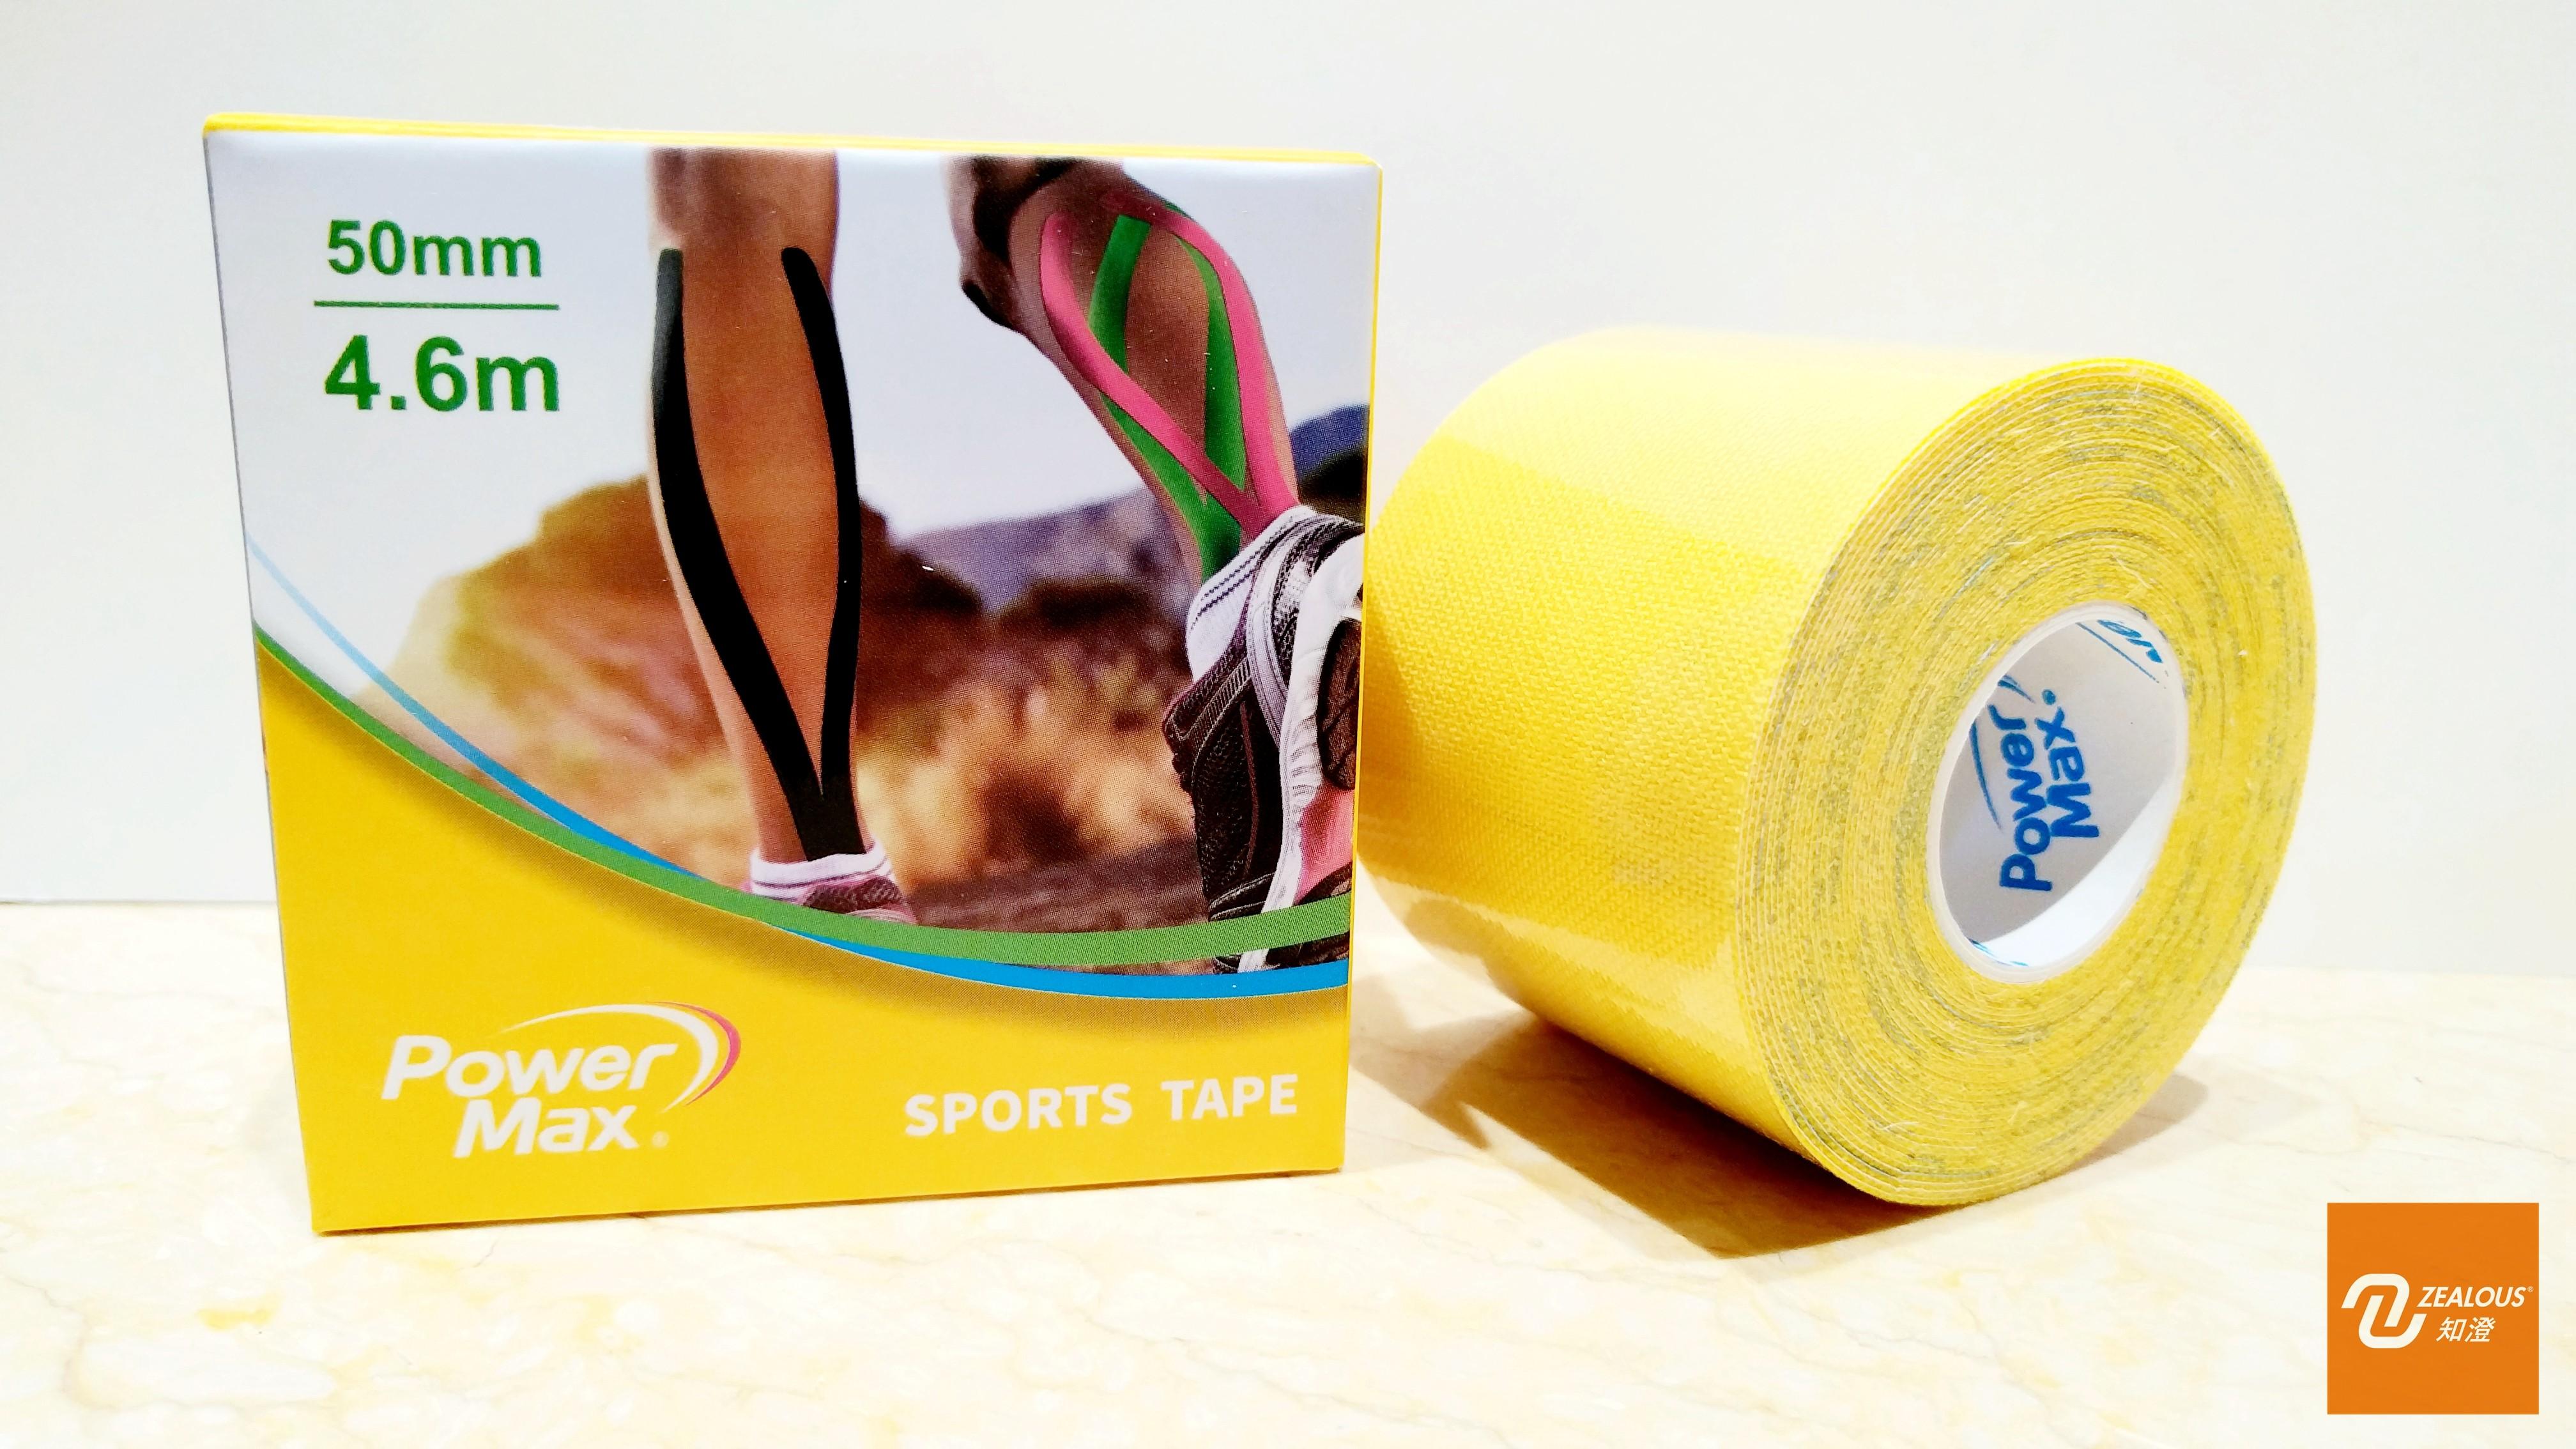 PowerMax Light 給力貼肌能貼 貝兒黃